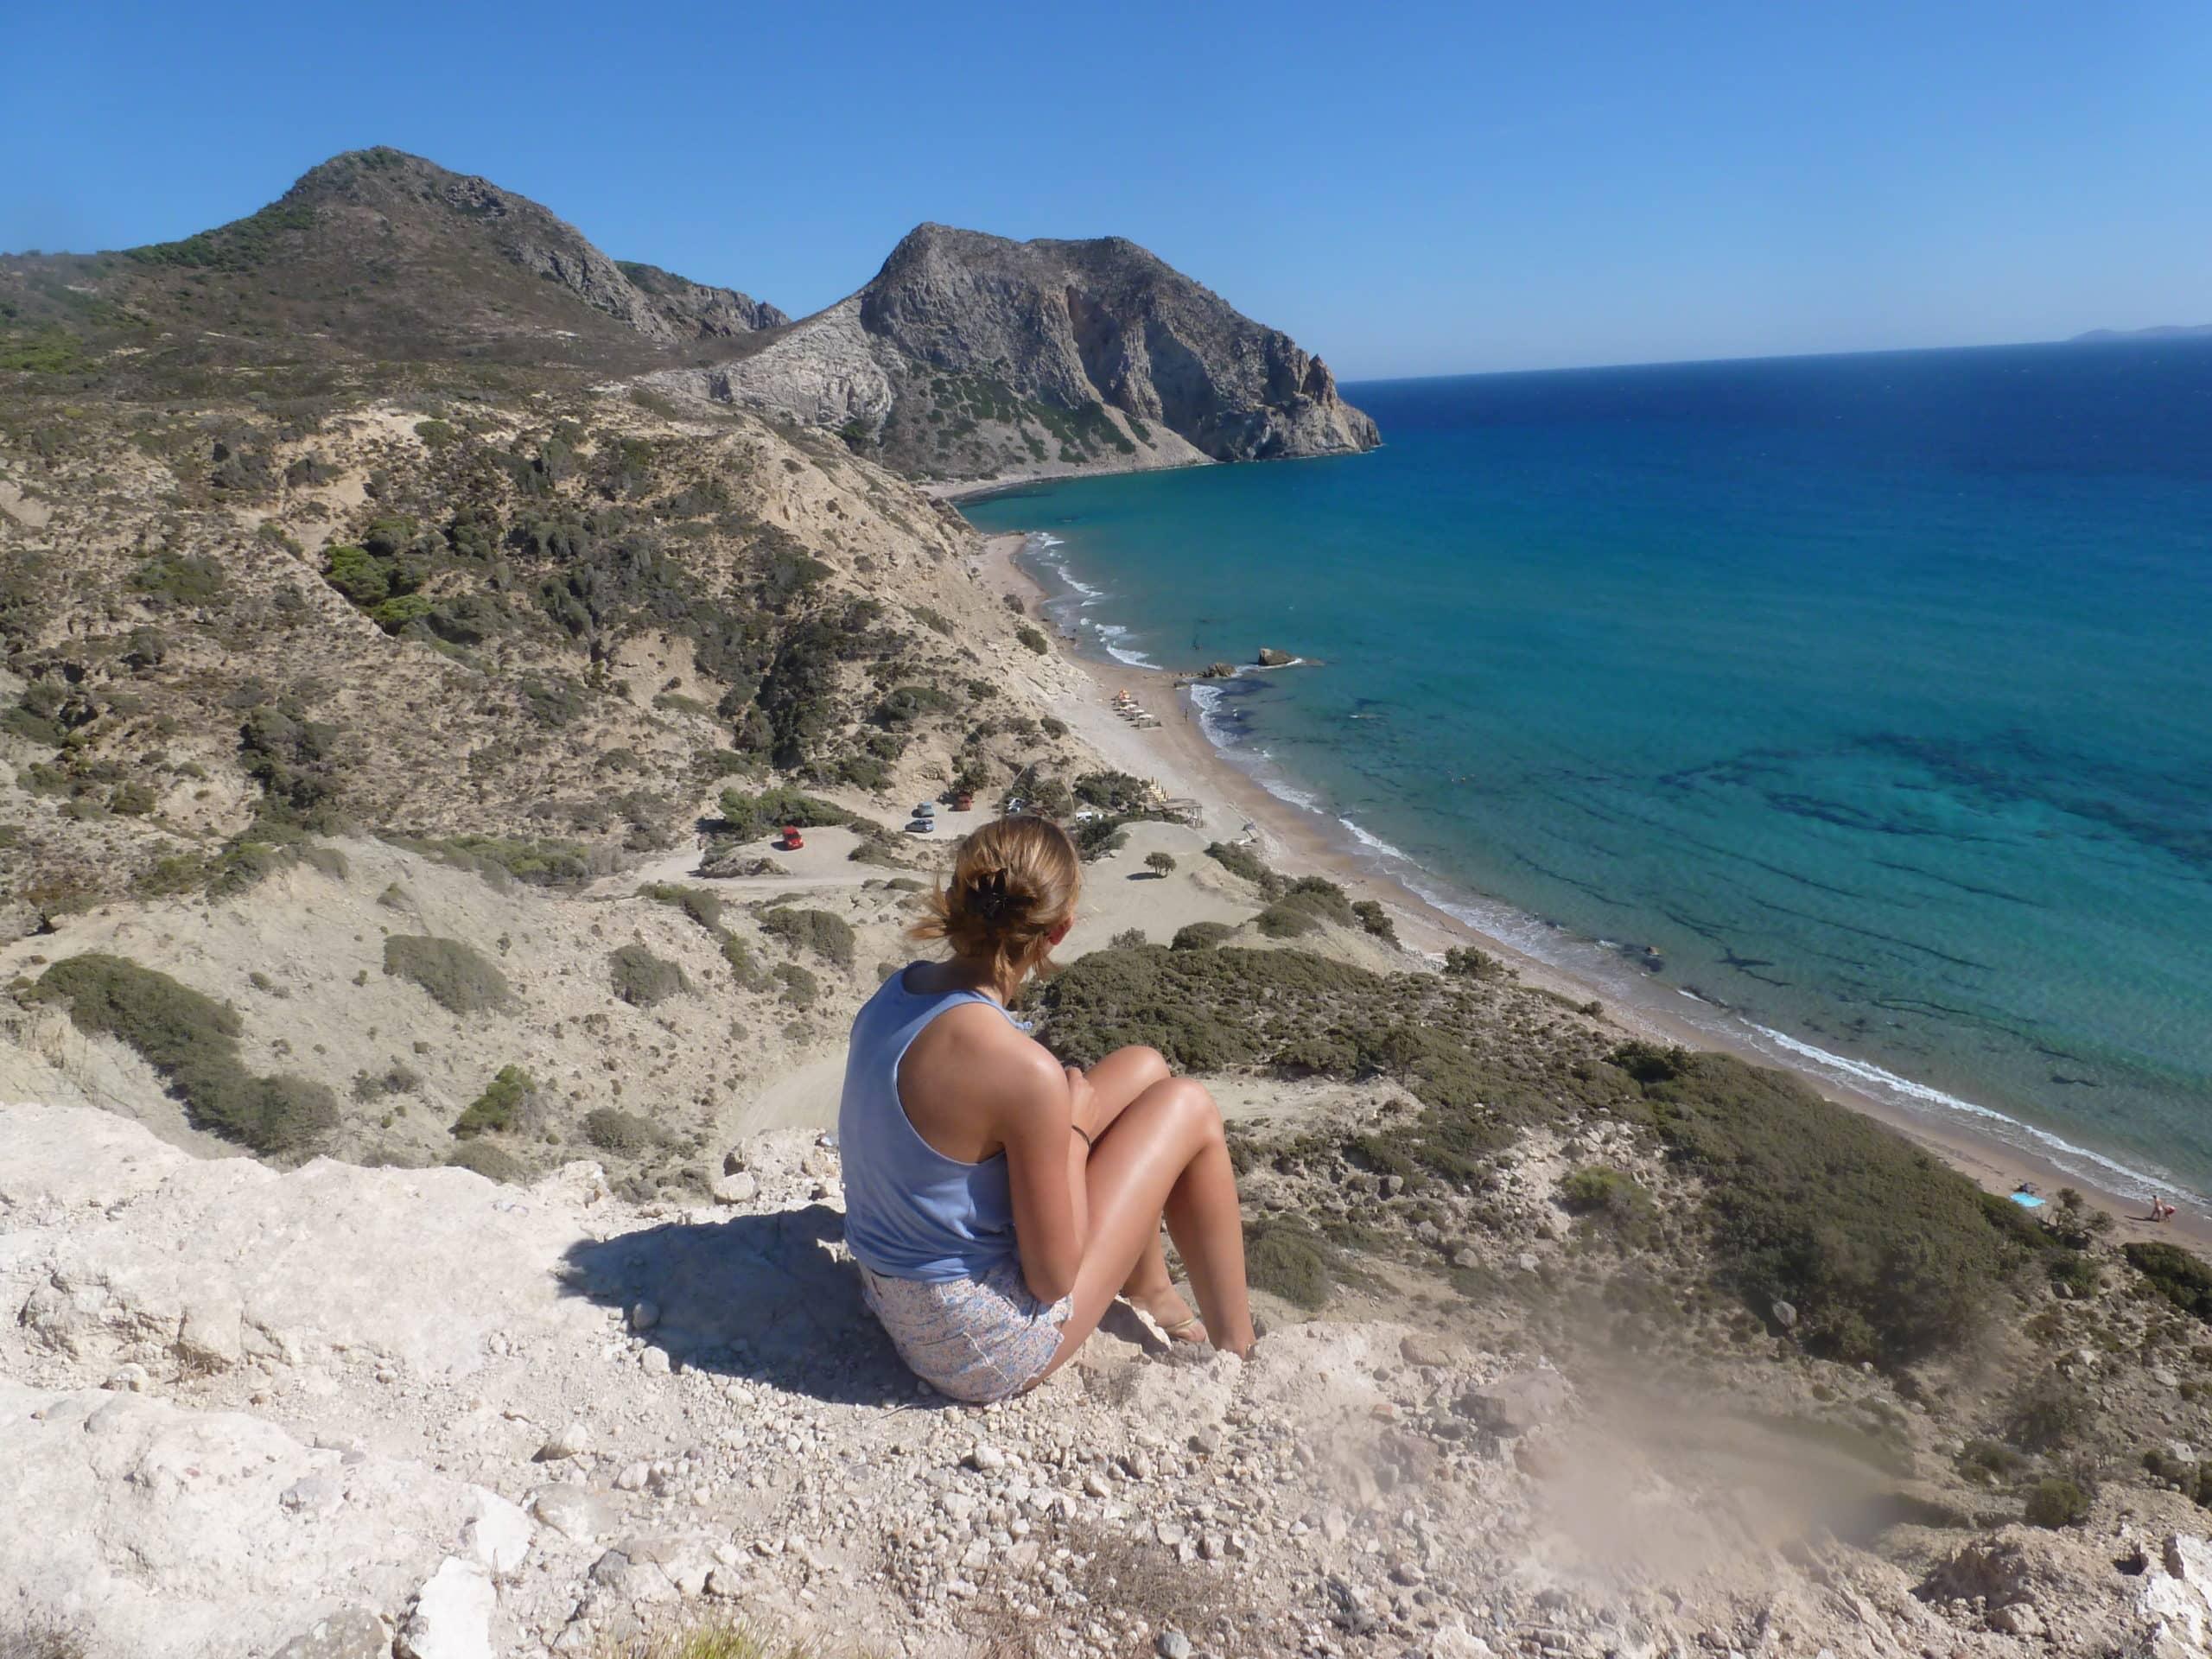 kos tipps-reiseblog-griechenland-kos-tipps